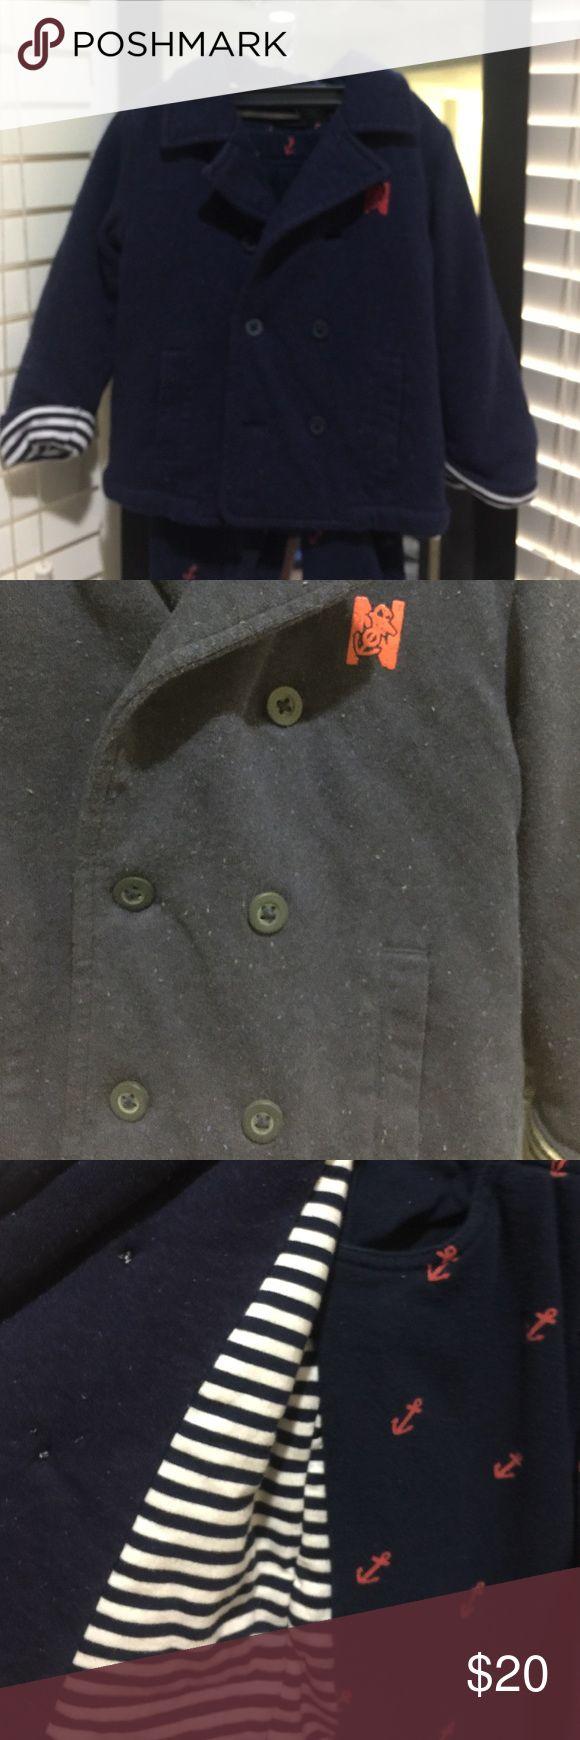 Nautica pants and peas coat set Nautica pants and pea coat/jacket set 2t 7/10 -8/10 condition boys toddler Nautica Jackets & Coats Pea Coats